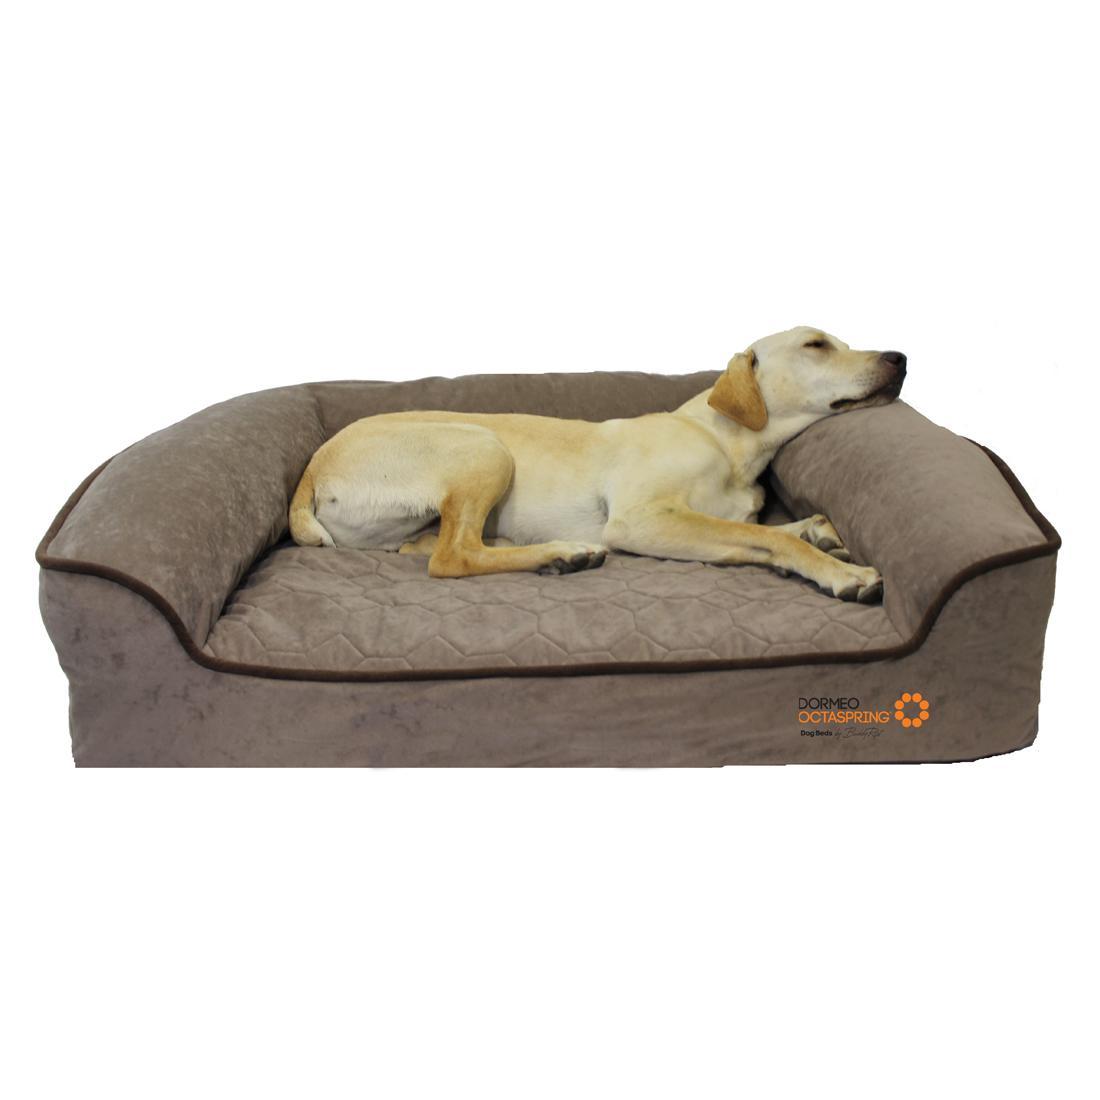 Dormeo Octaspring dog beds by BuddyRest